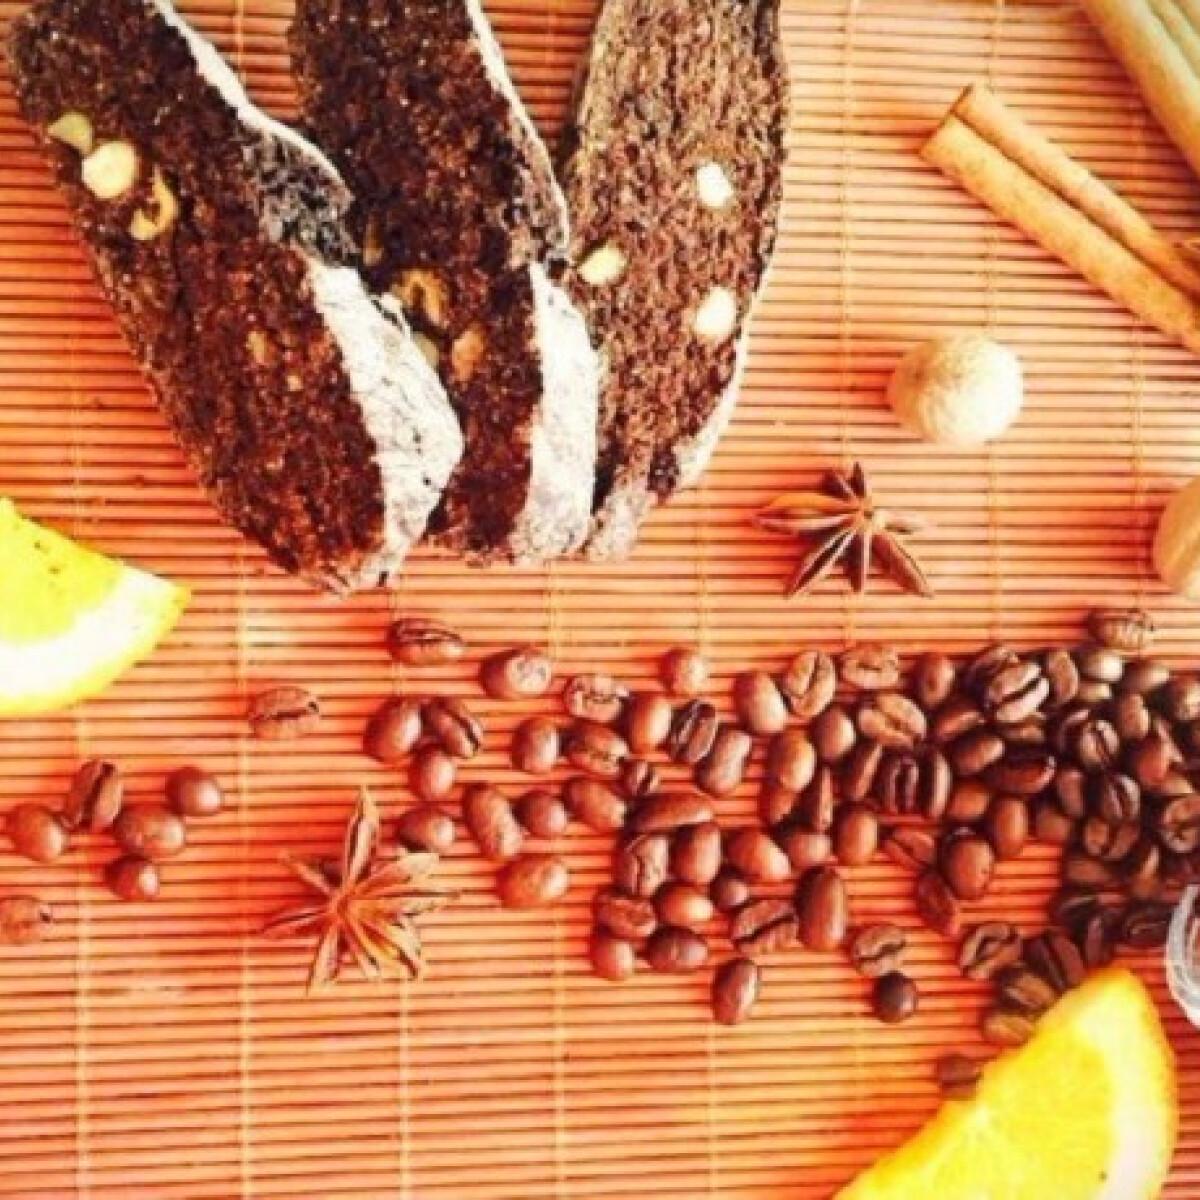 Kávés-fűszeres biscotti